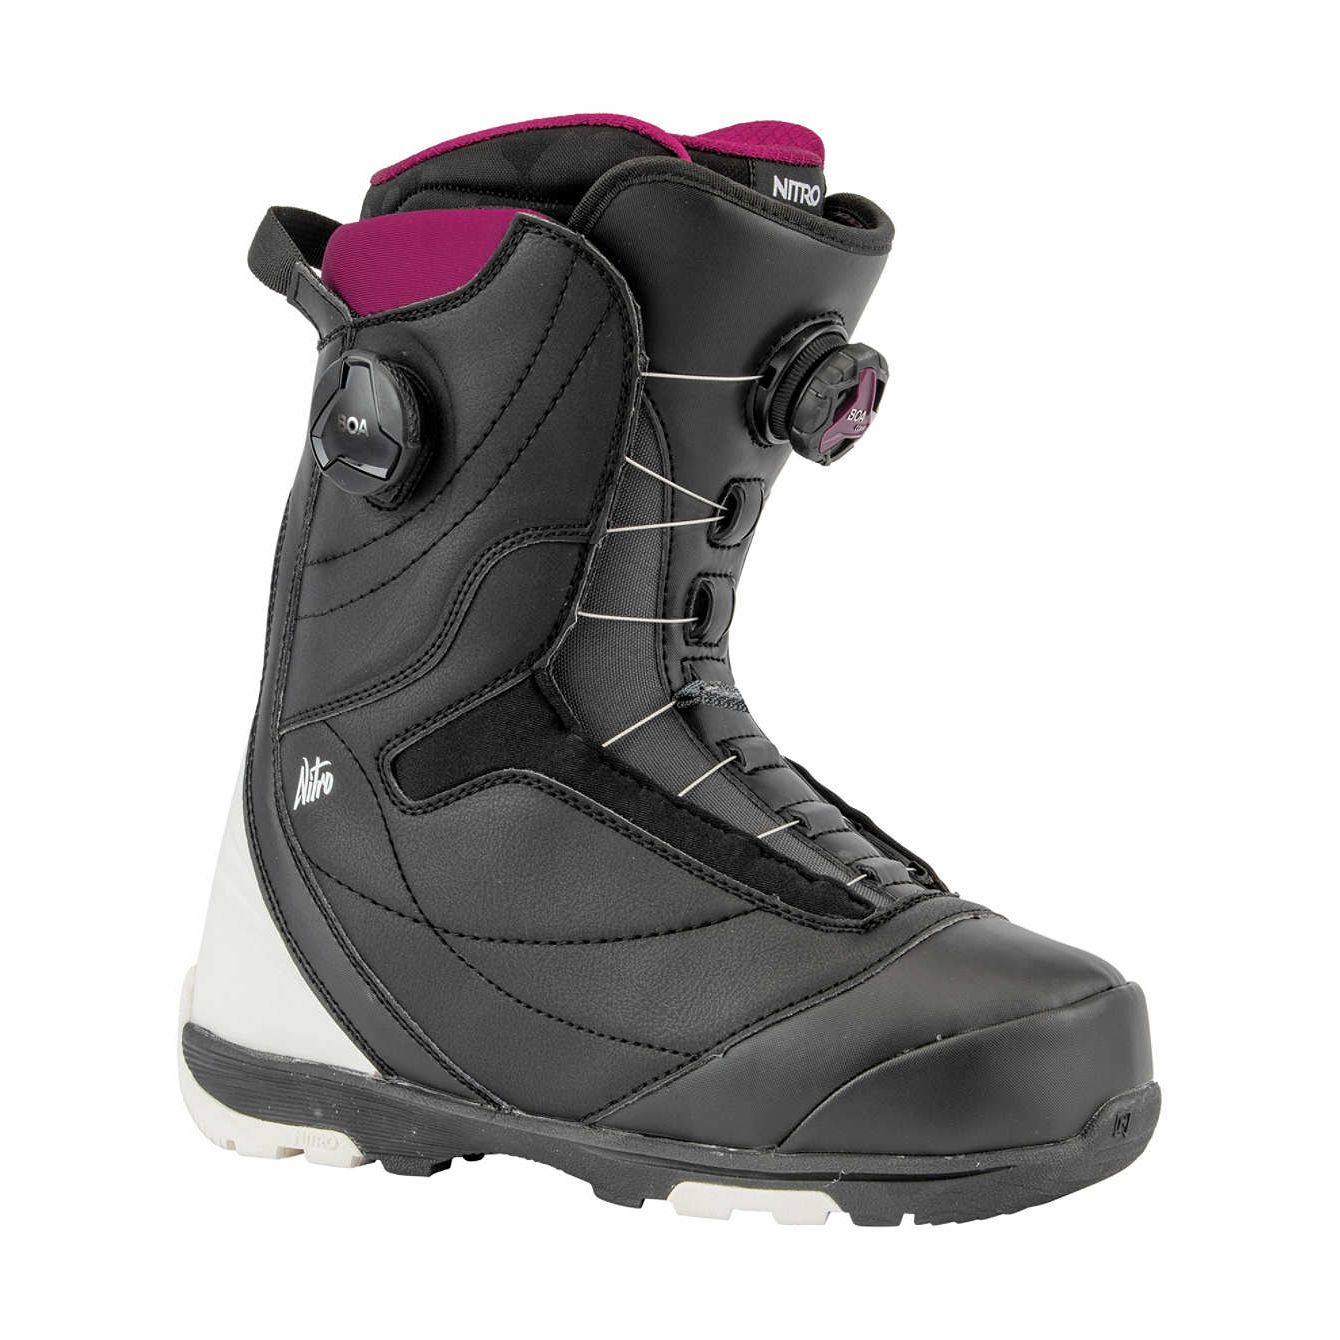 Boots snowboard femei Nitro Cypress Dual BOA Negru/Alb 19/20 imagine